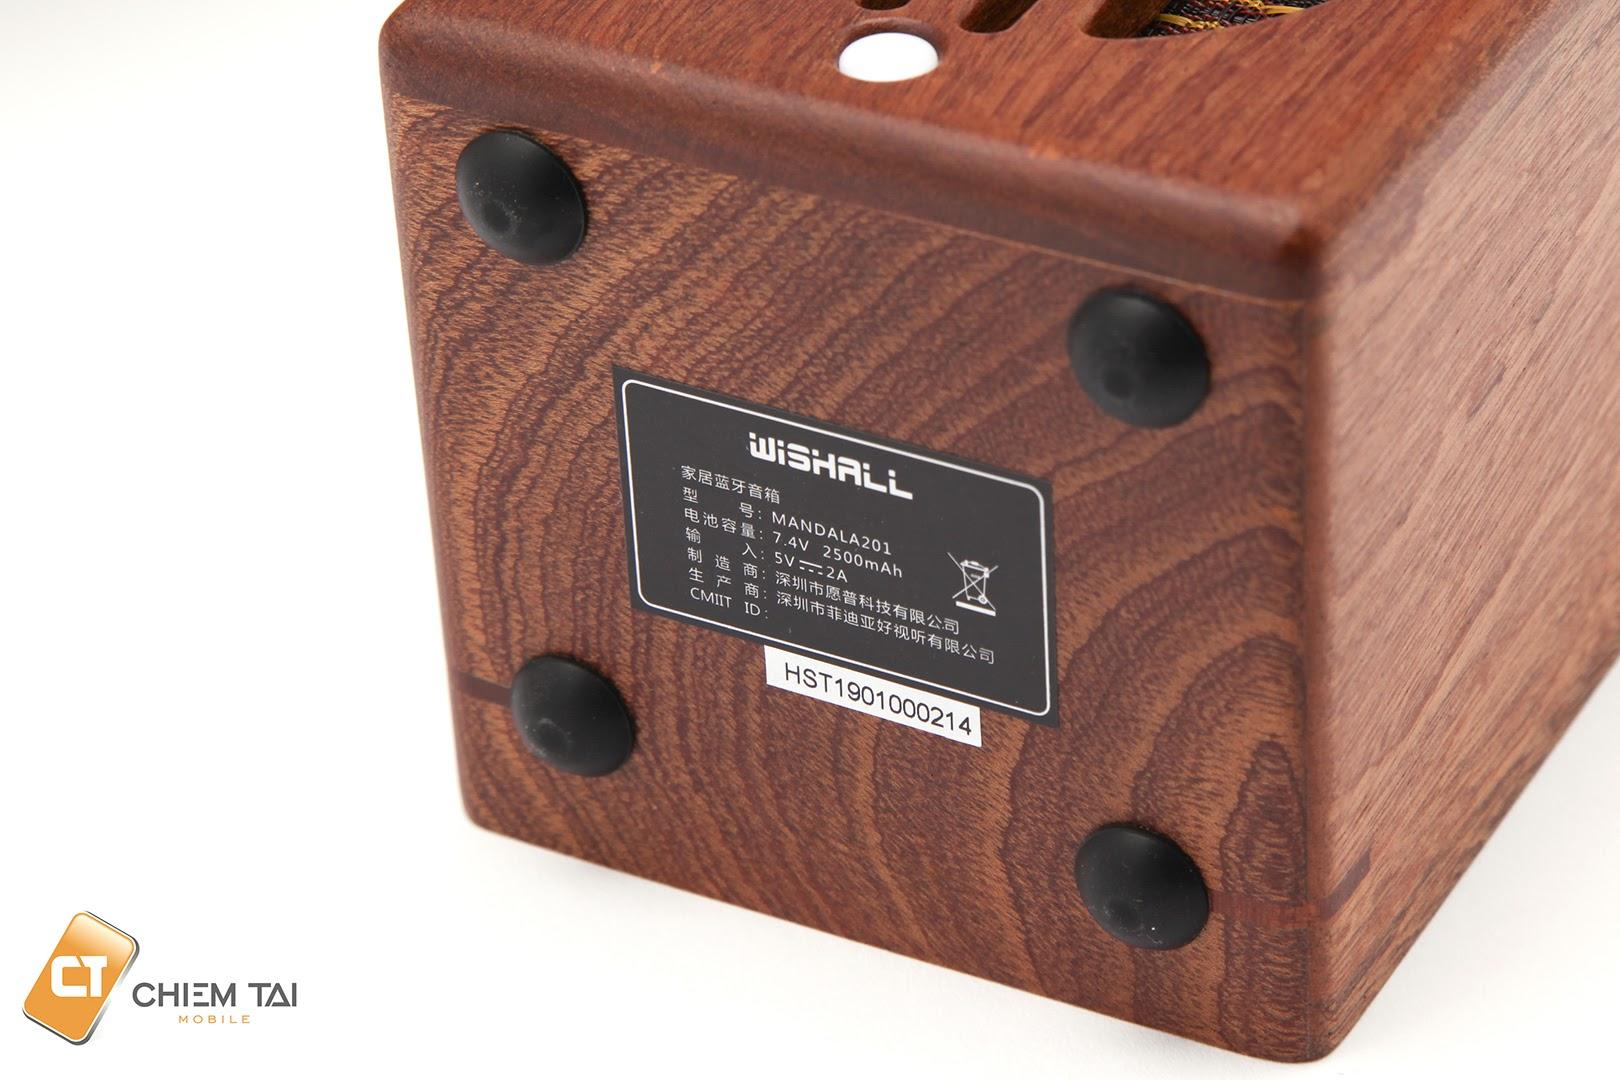 Loa Bluetooth Music Clock Wishall MANDALA201